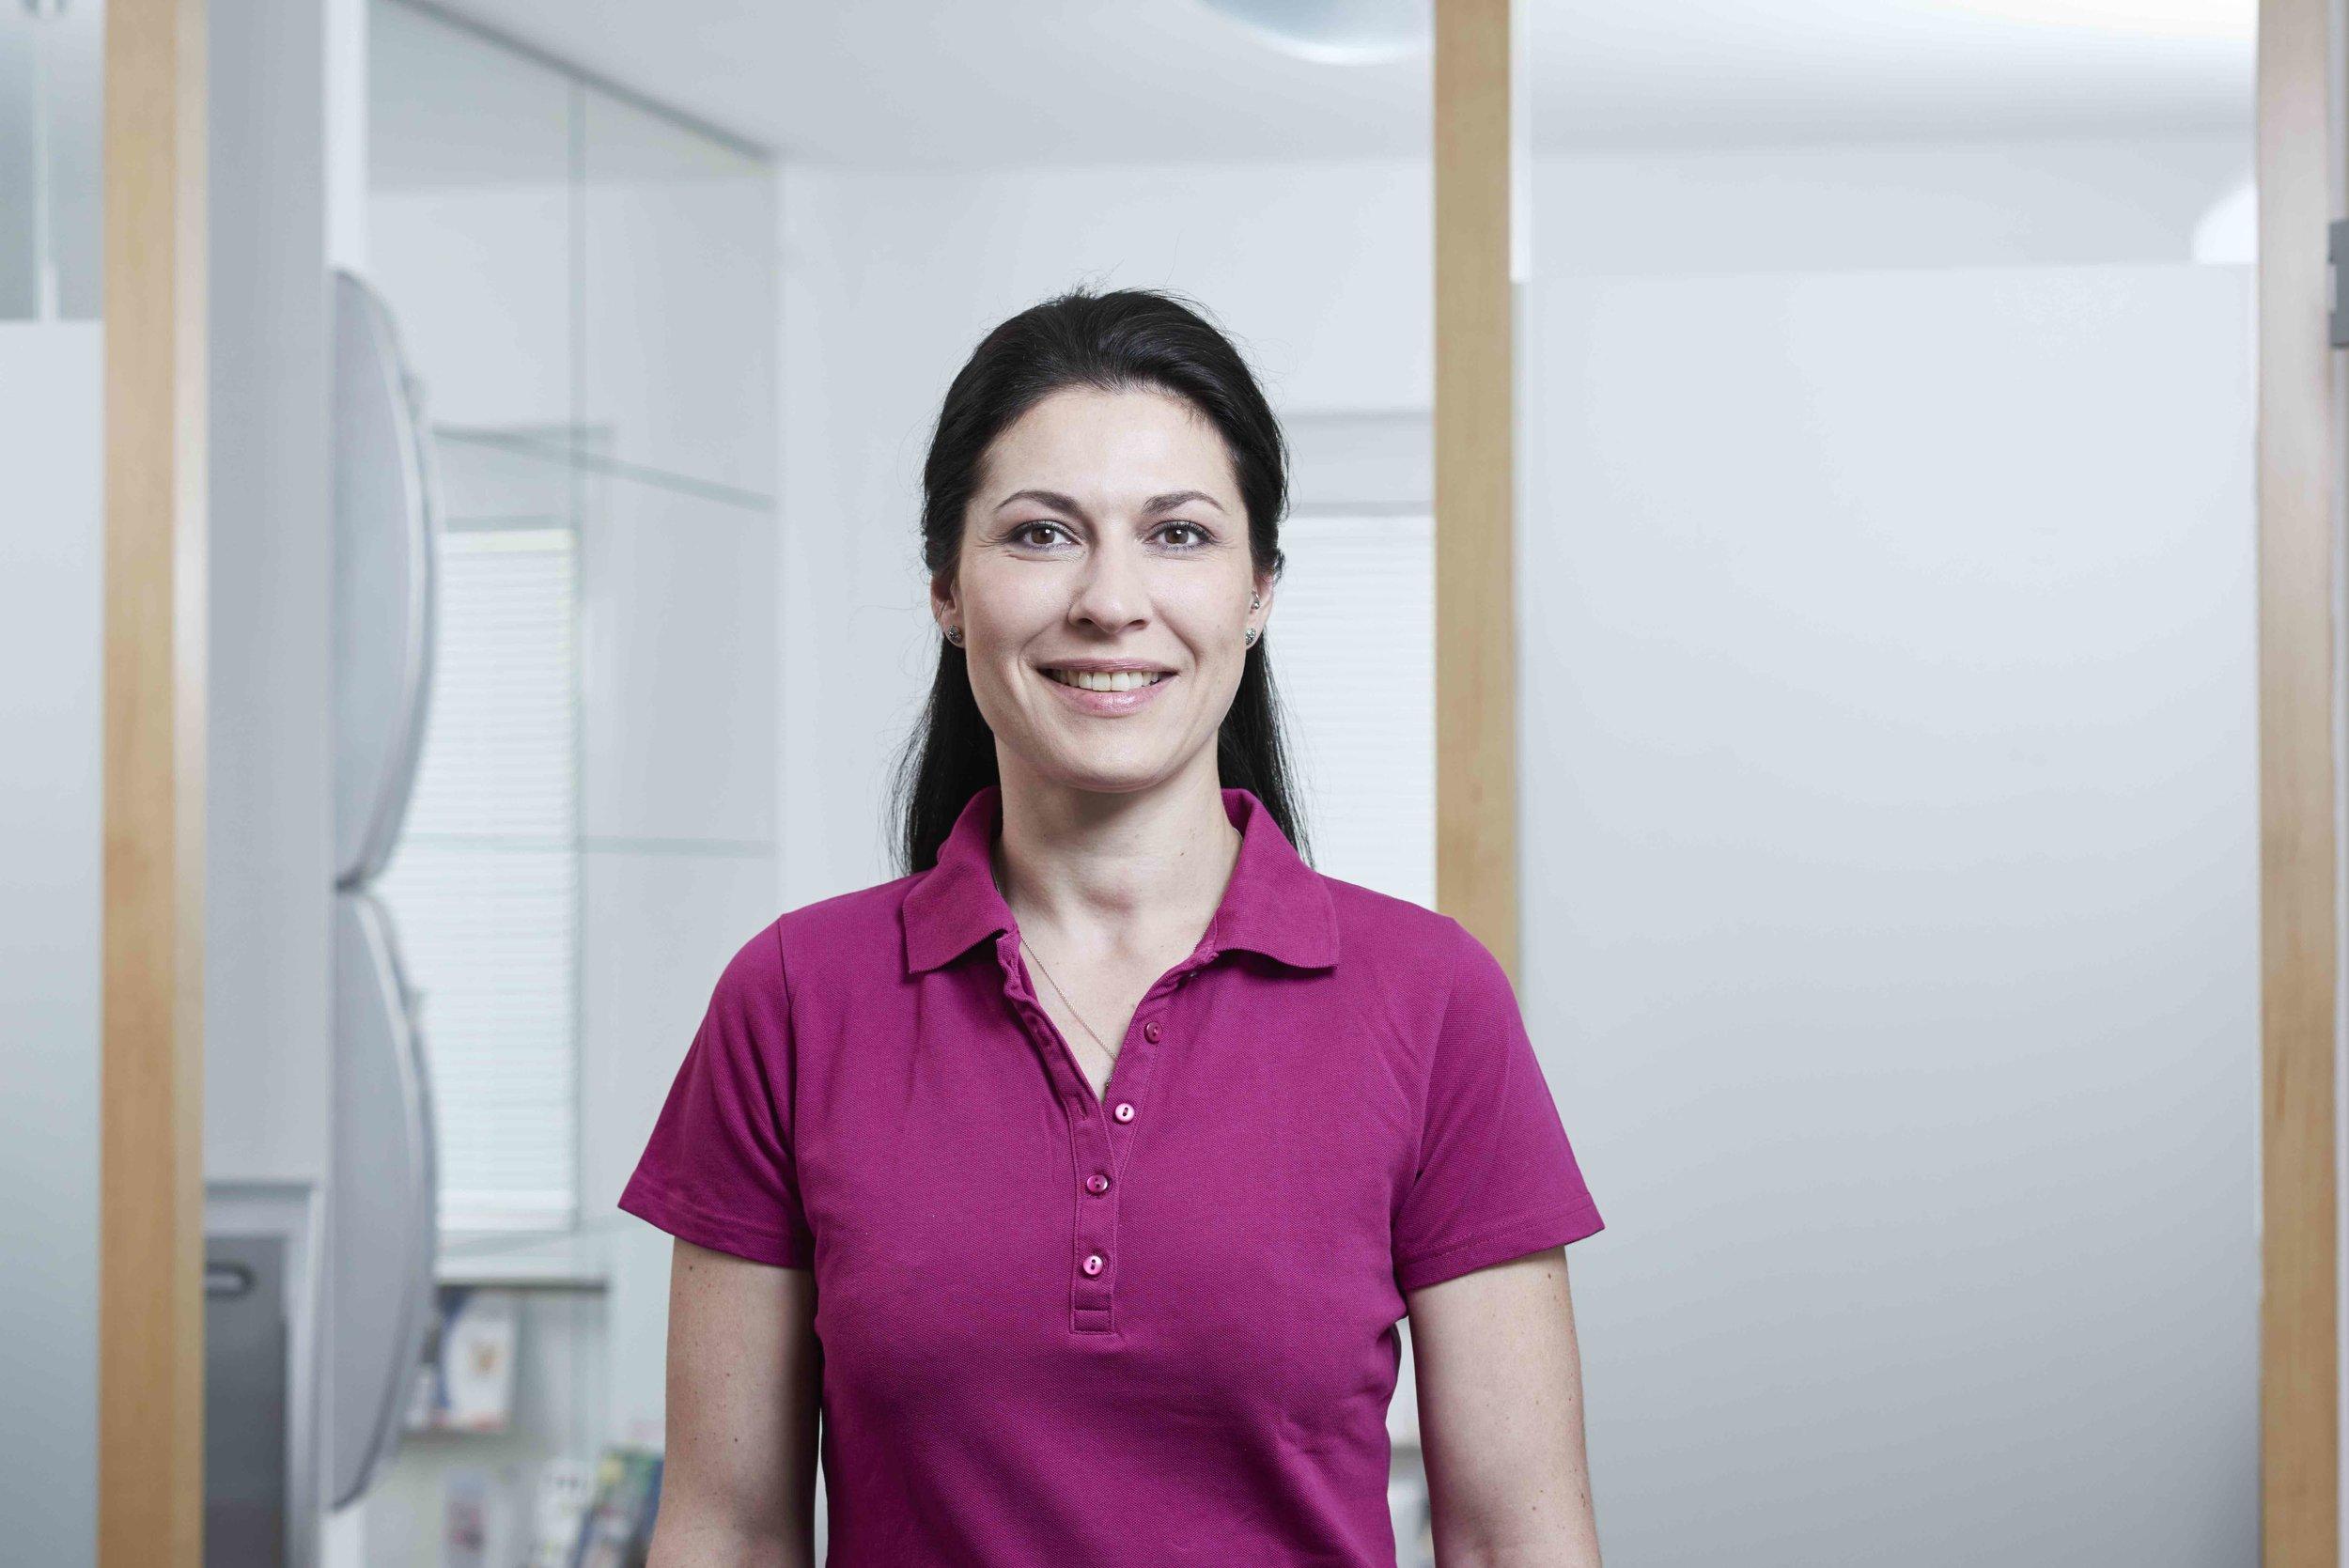 Hautarzt-Weinheim_Dr-Nina-Mueller_Mitarbeiter_Jasminka Deovic_012.jpeg